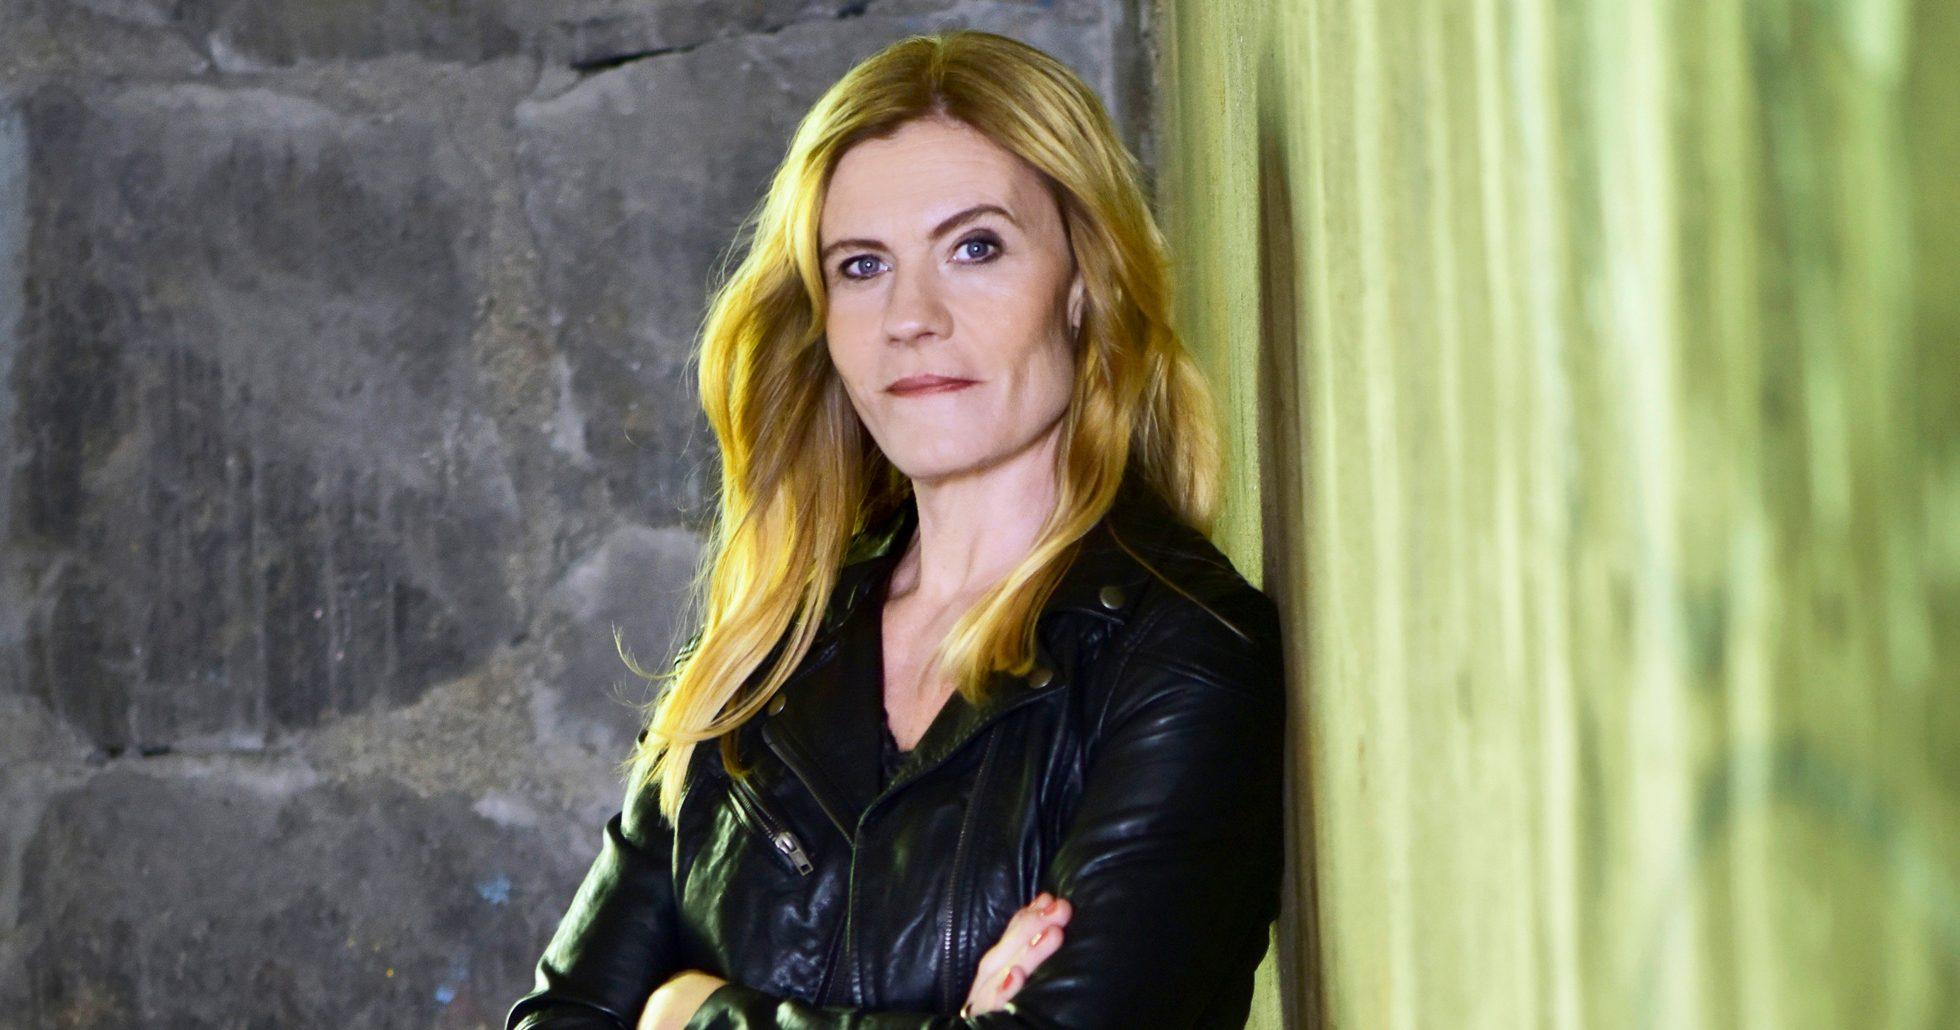 Tina Frennstedt skriver romaner baserade på verkliga fall